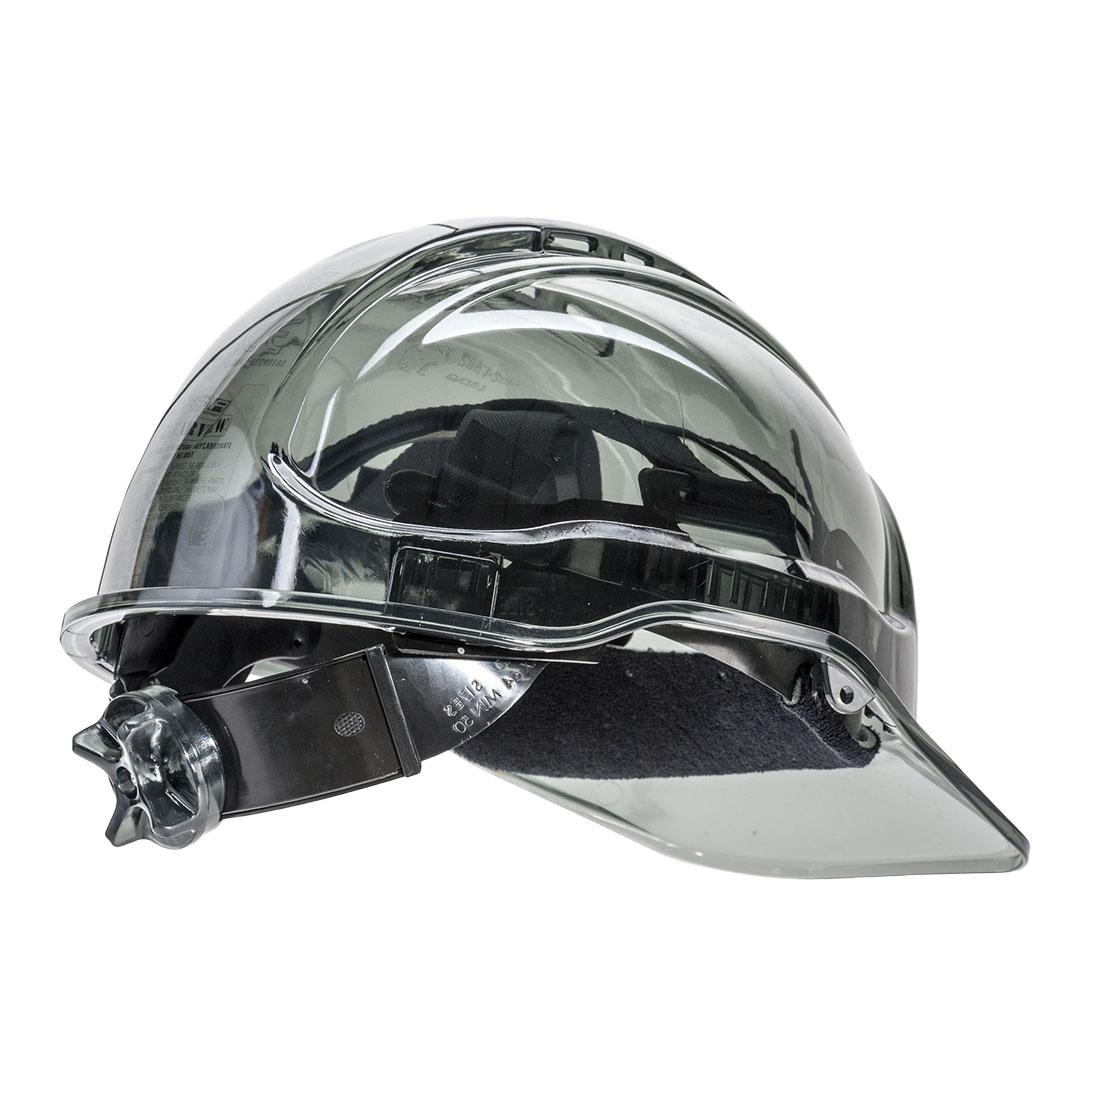 Peak View Ratchet Vent Helmet Smoke